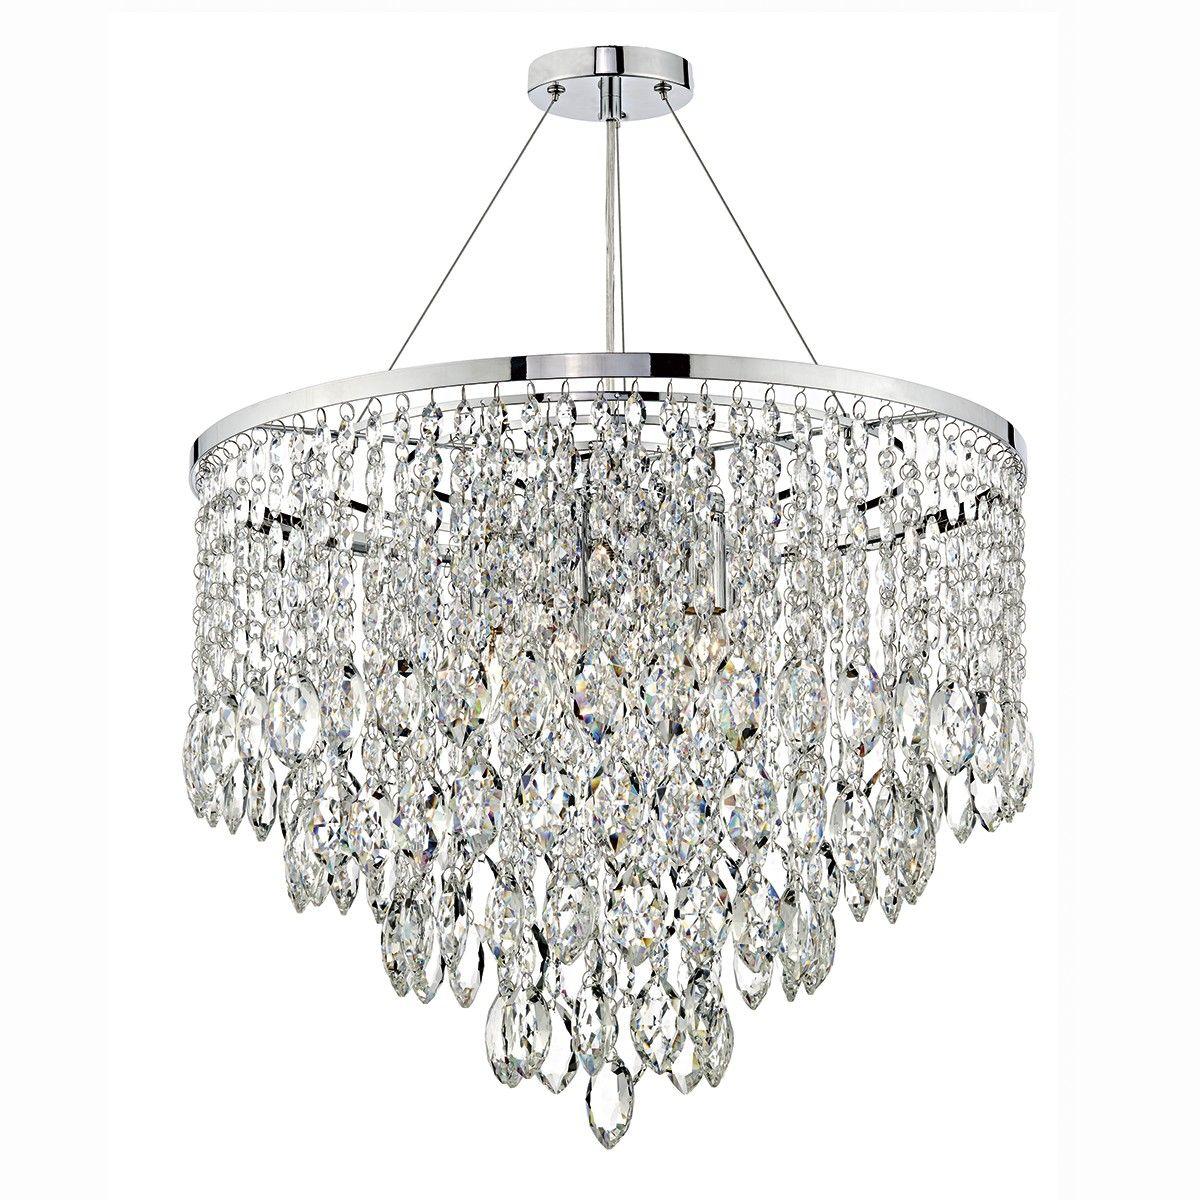 Pescara 5 light round pendant decorative crystal min height is 55cm pescara 5 light round pendant decorative crystal min height is 55cm might be too mozeypictures Gallery